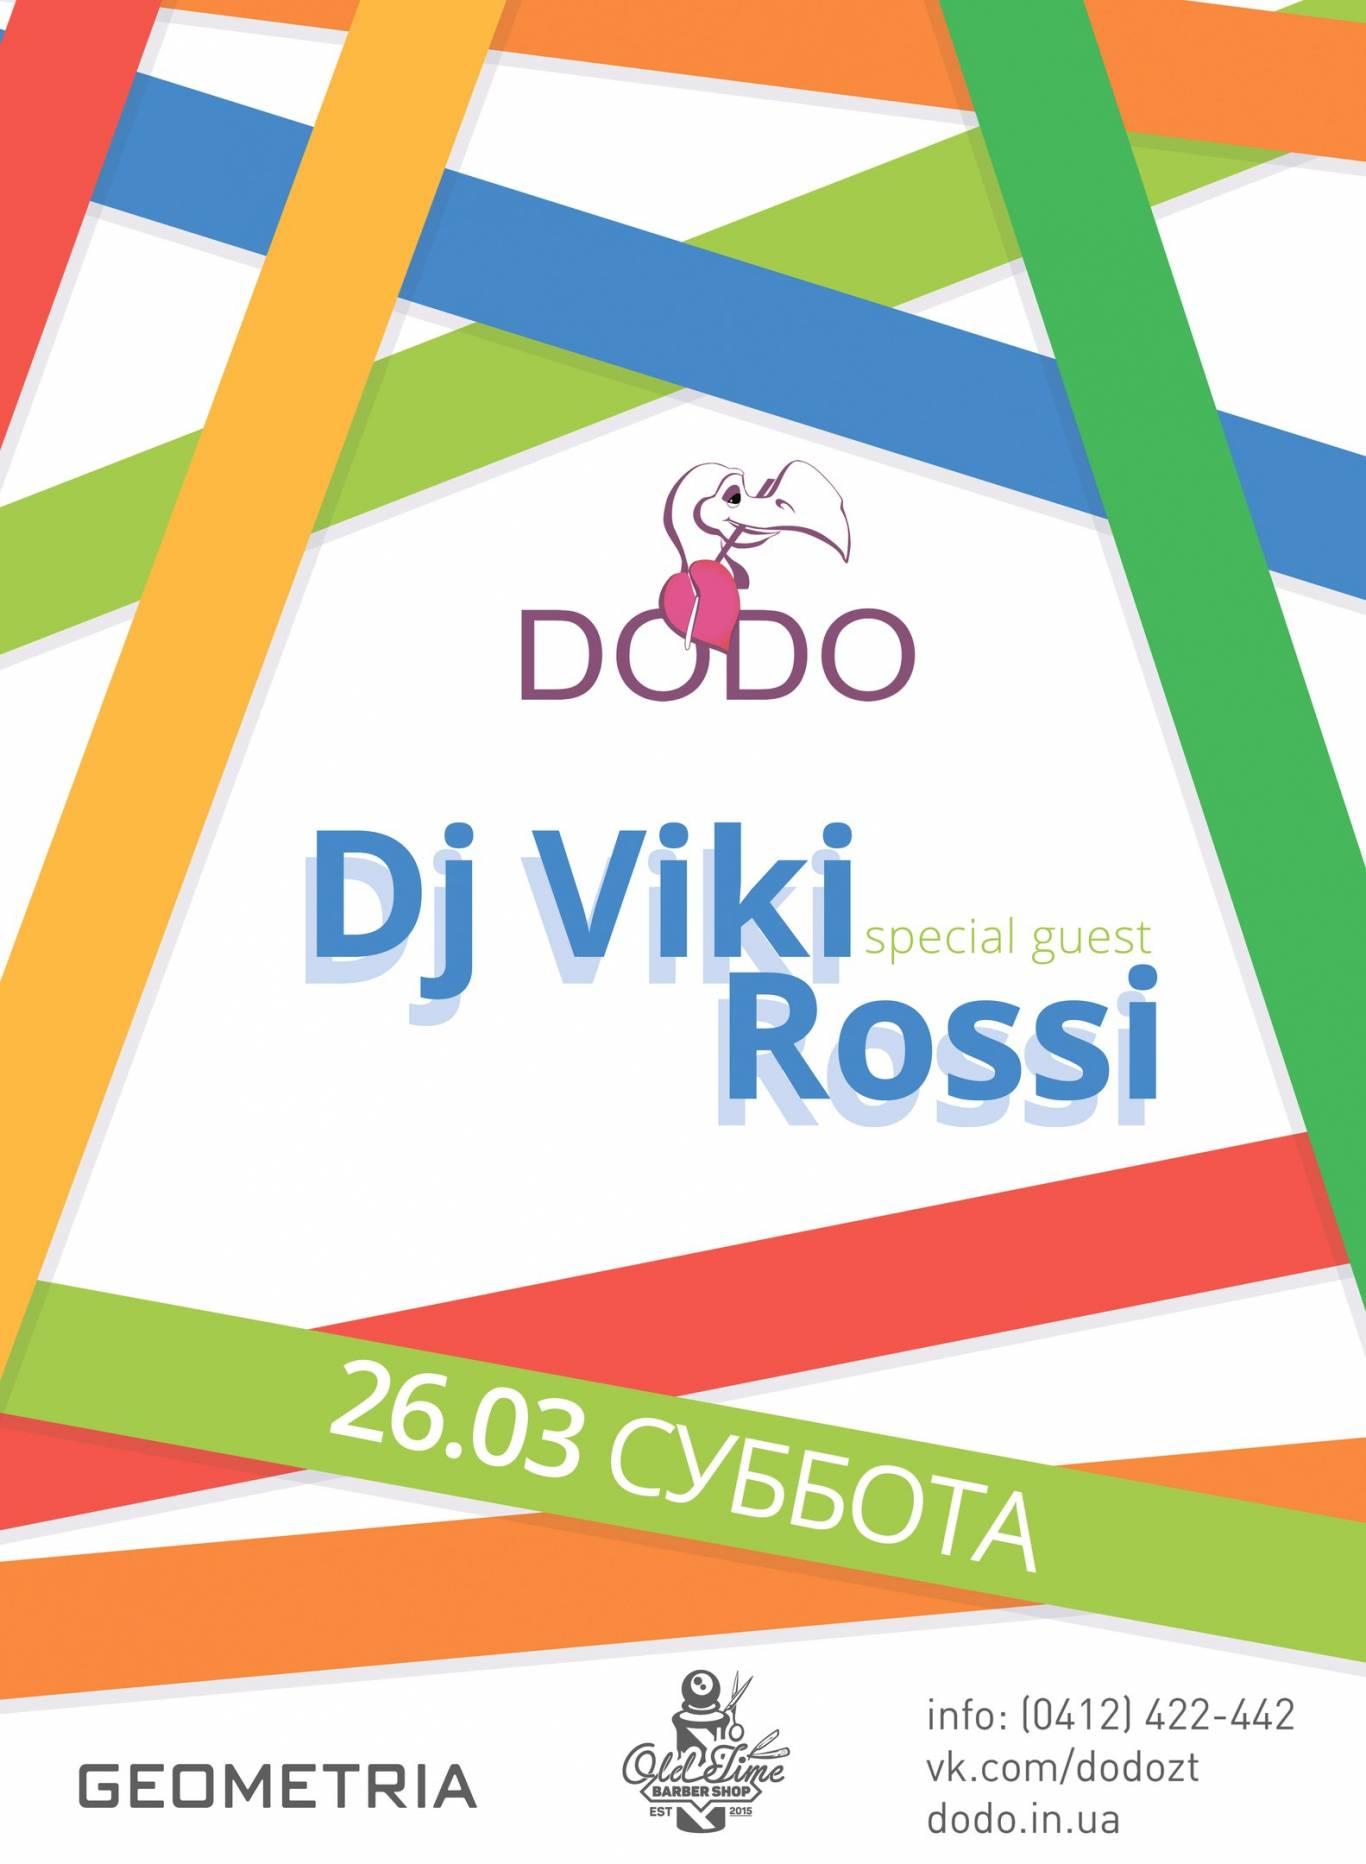 DJ VIKI ROSSI  в ''DODO''